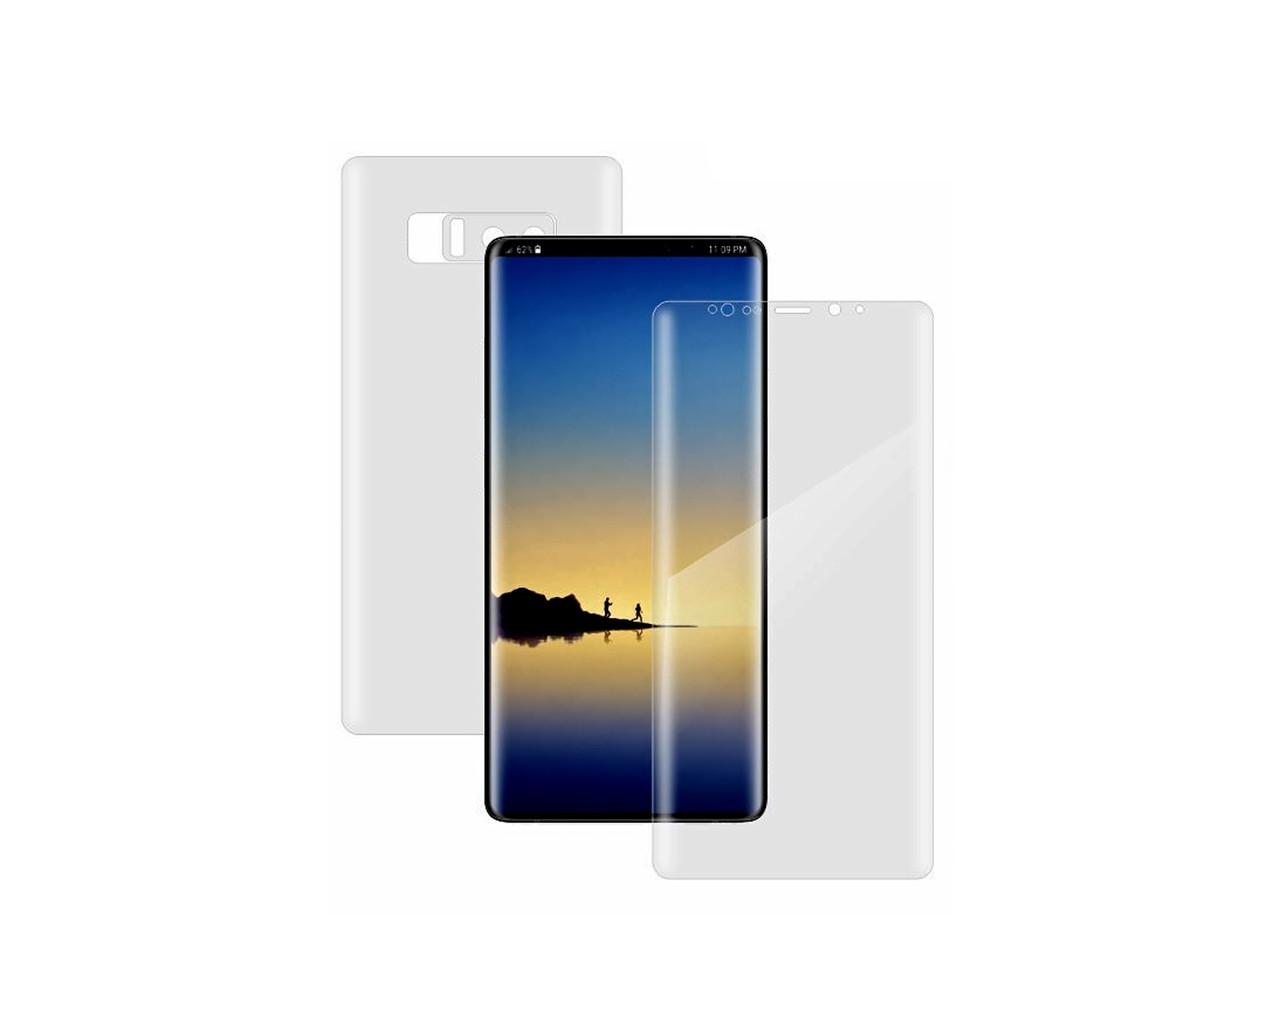 Защитная пленка 2 стороны - лицевая и обратная SO EASY ITOP 360 для Samsung Galaxy Note 8 Full Cover